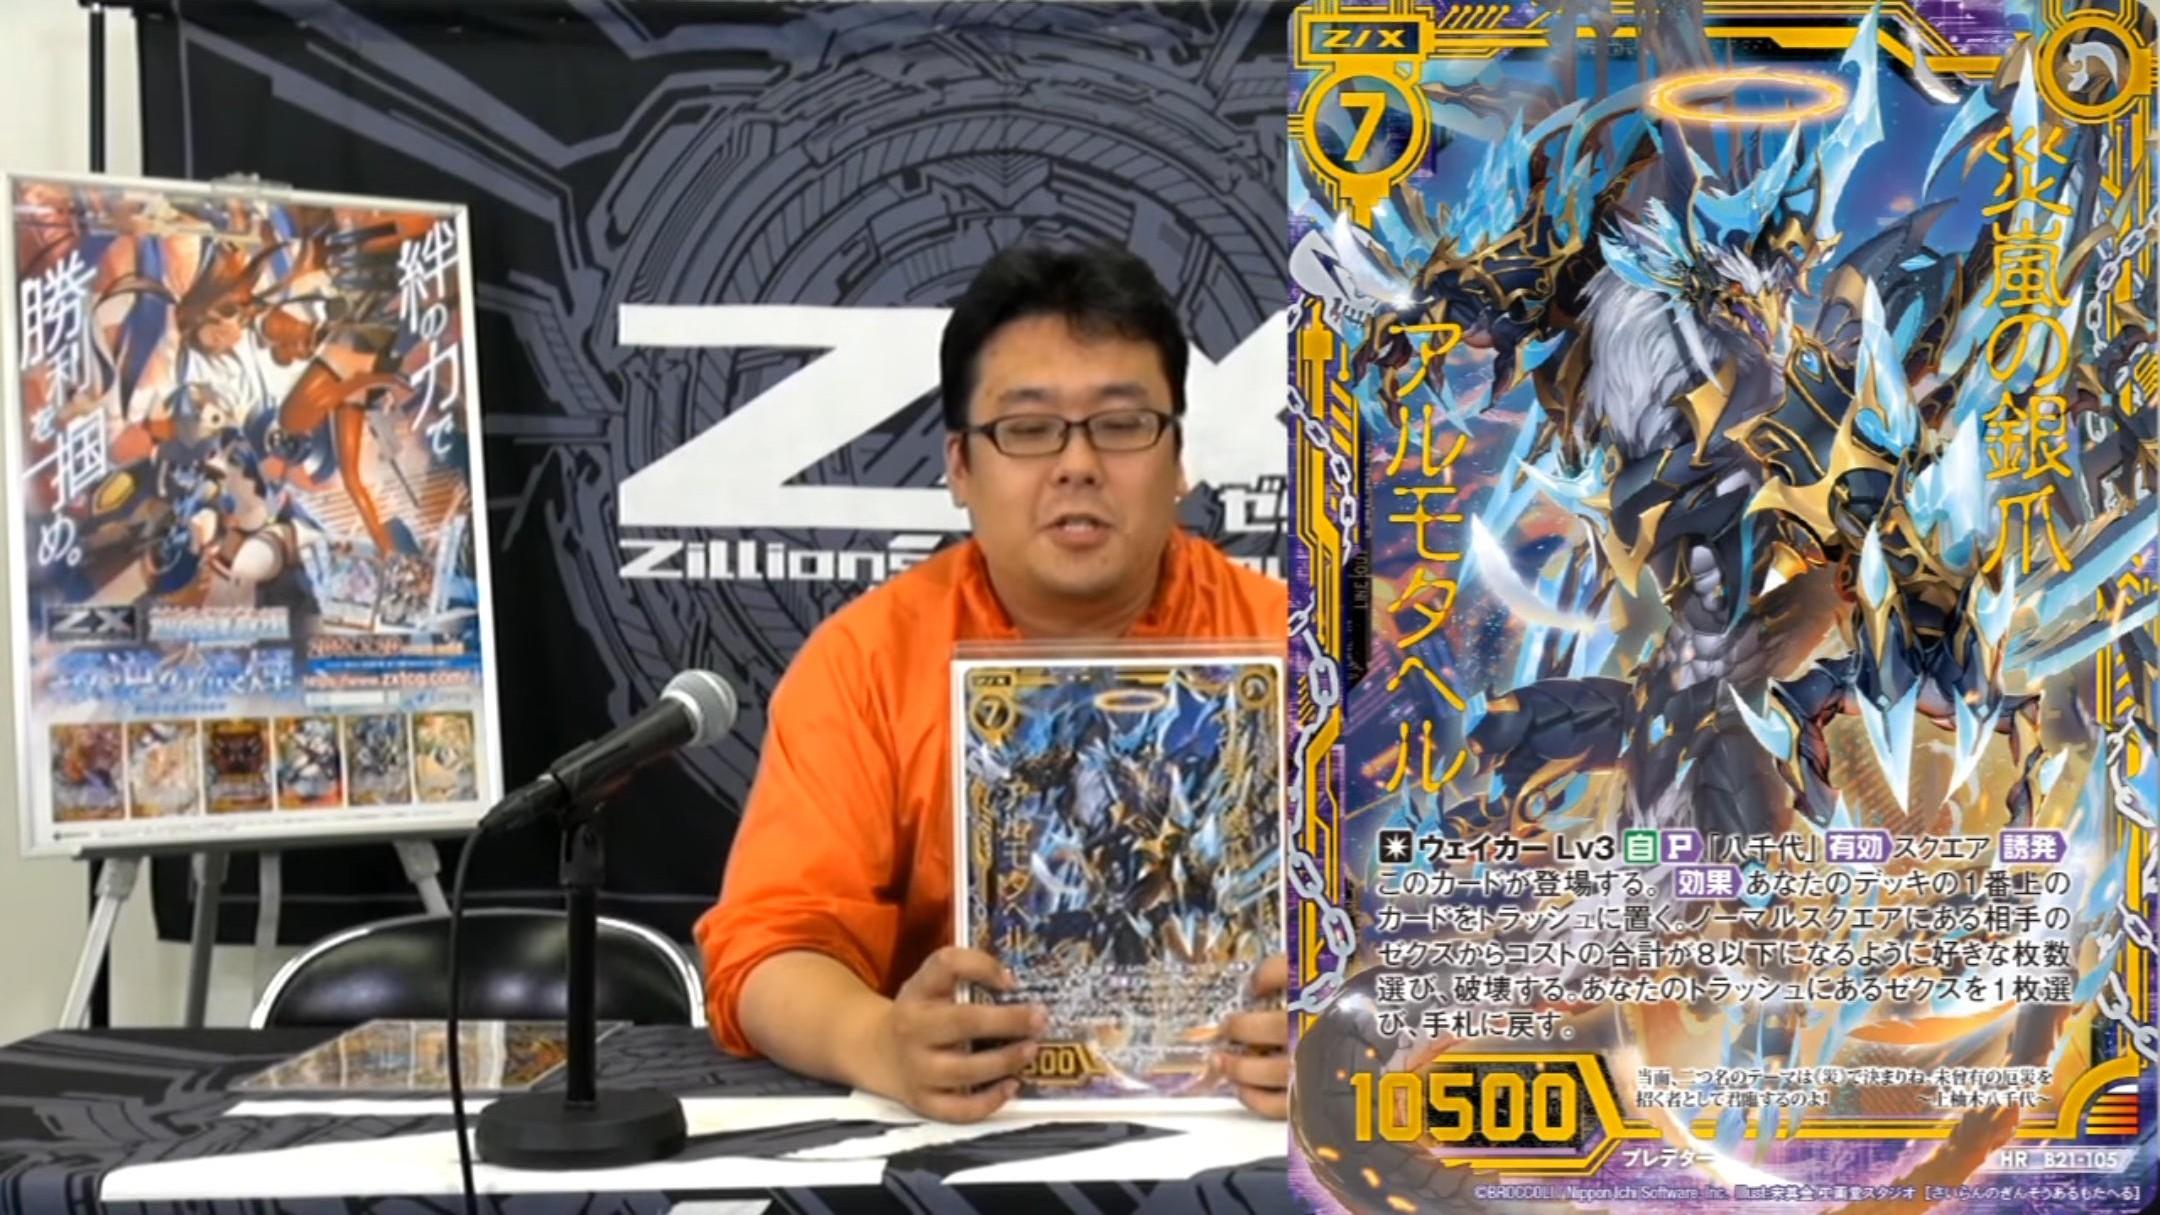 zx-youtube-1700517-006.jpg